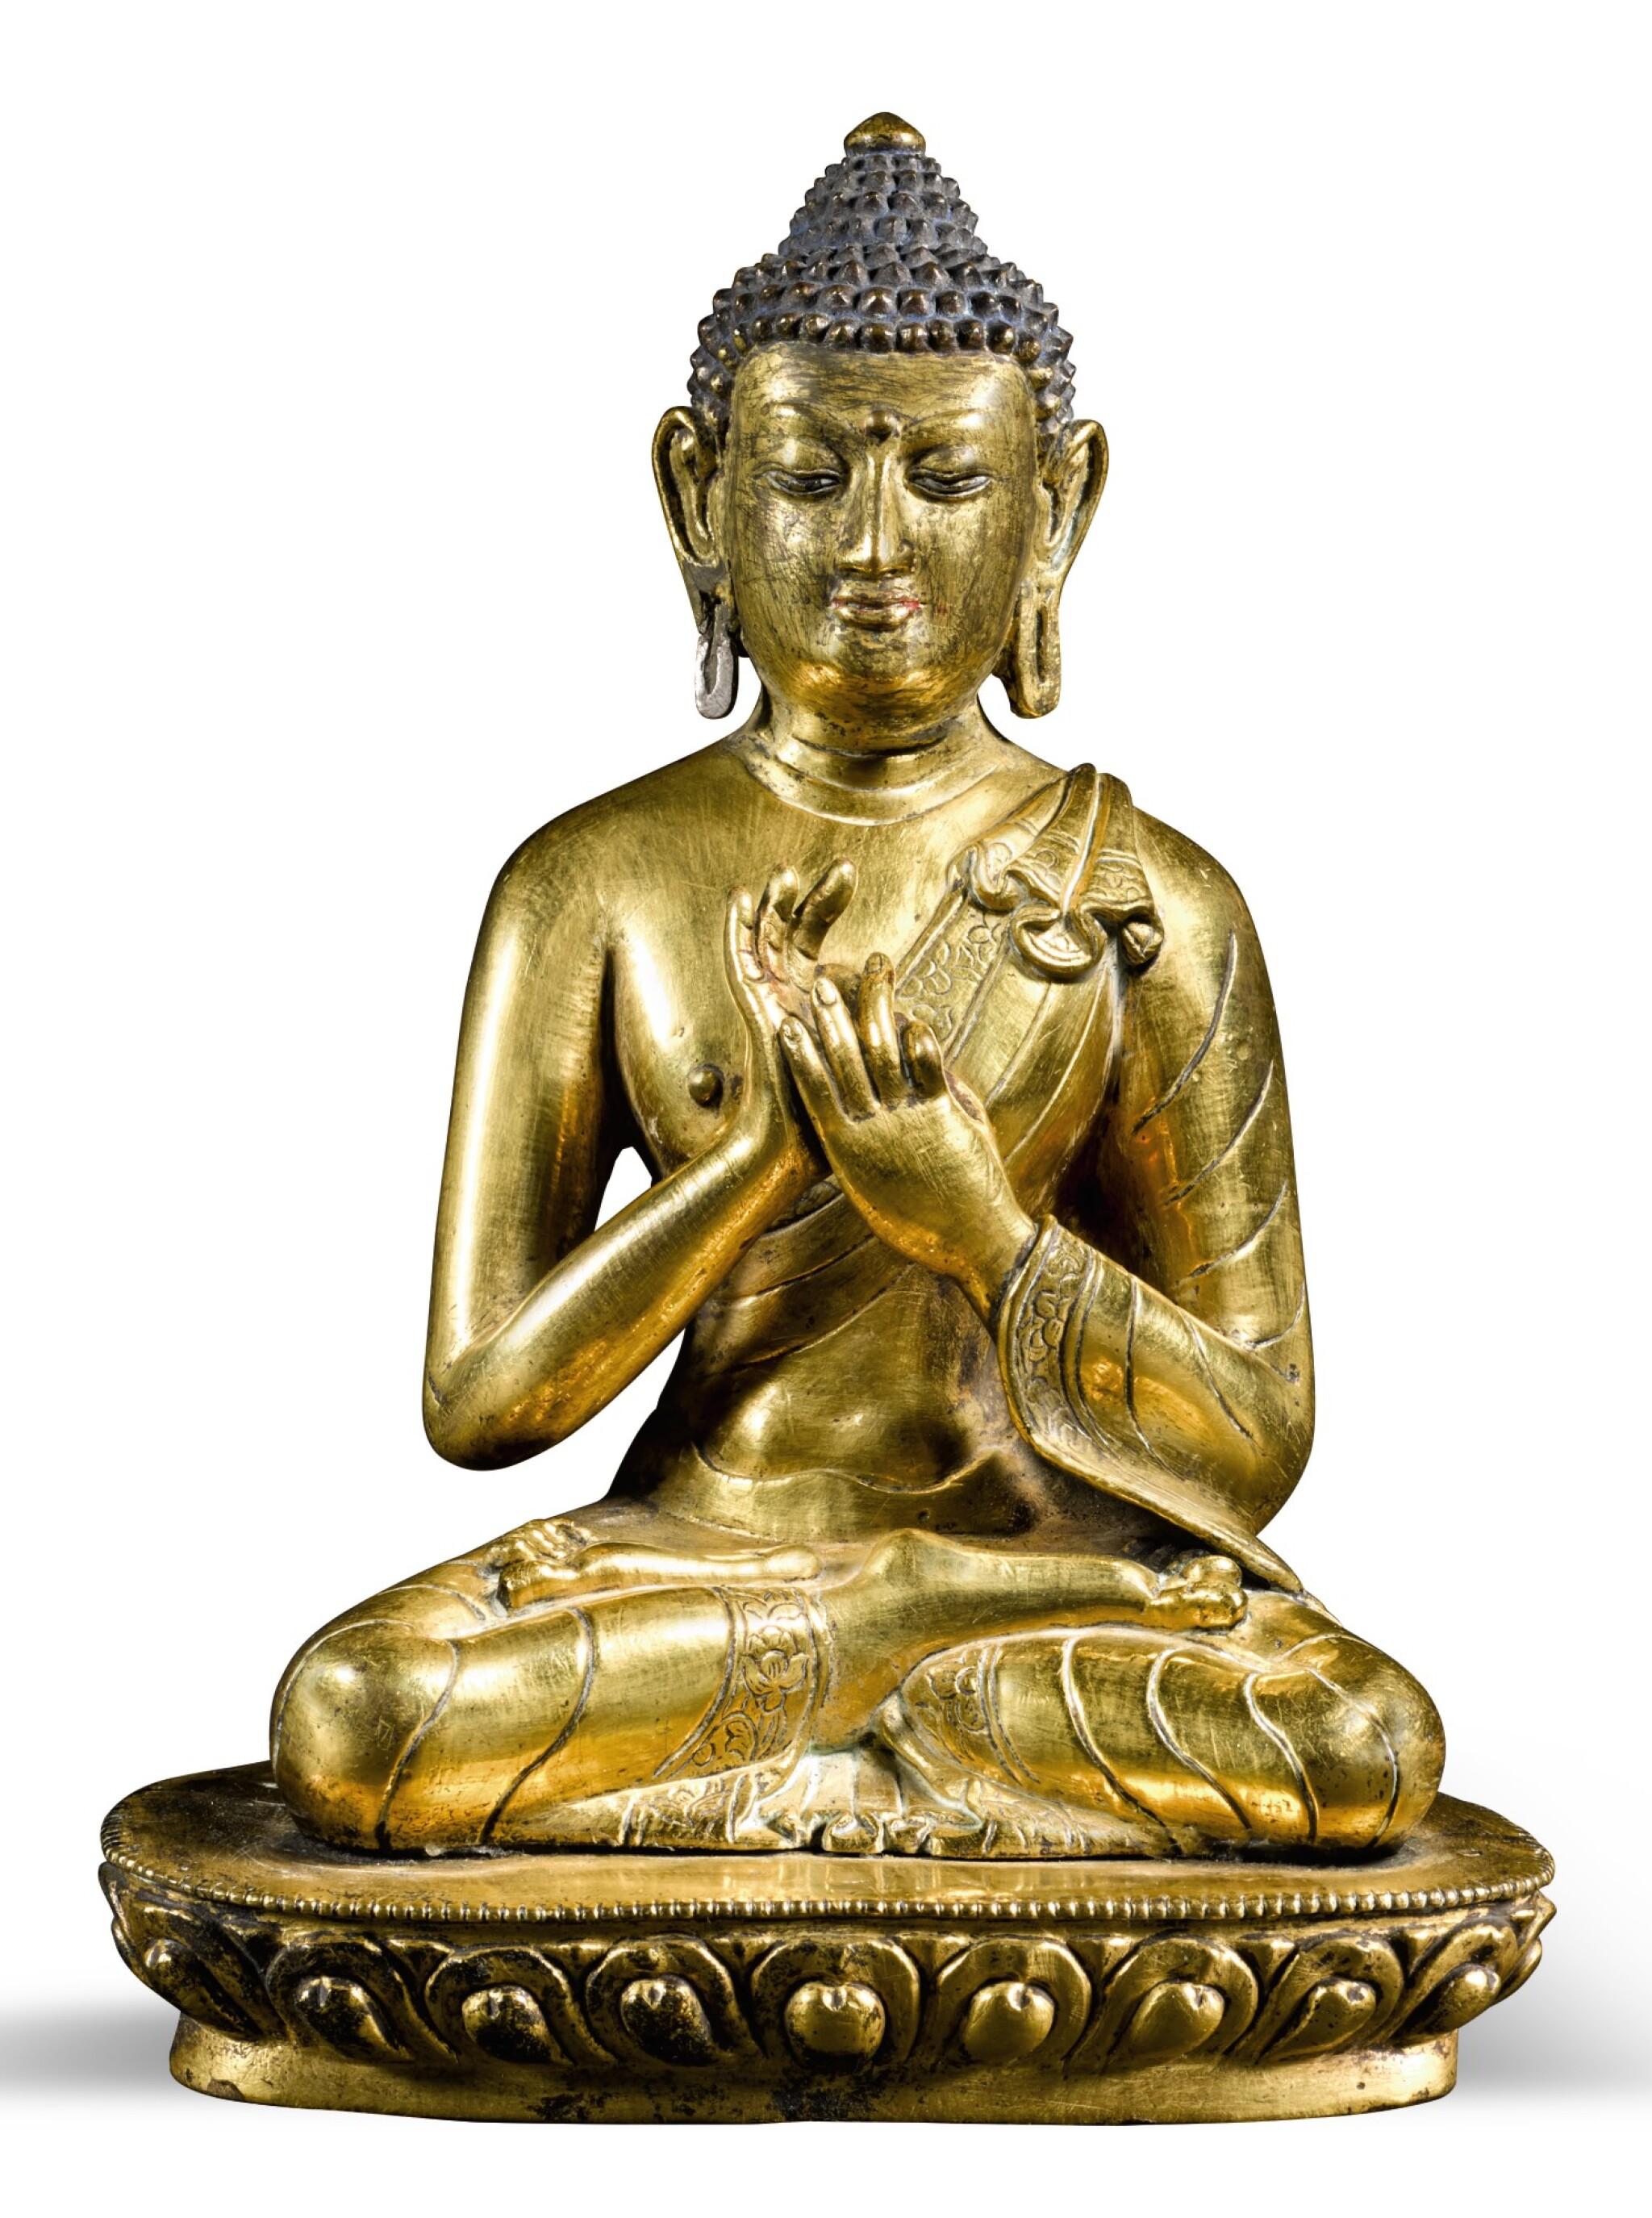 View full screen - View 1 of Lot 258. A GILT COPPER-ALLOY FIGURE OF A DHARMACHAKRA BUDDHA TIBET OR NEPAL, 18TH/19TH CENTURY | 十八/十九世紀 尼泊爾或西藏 鎏金銅佛坐像.